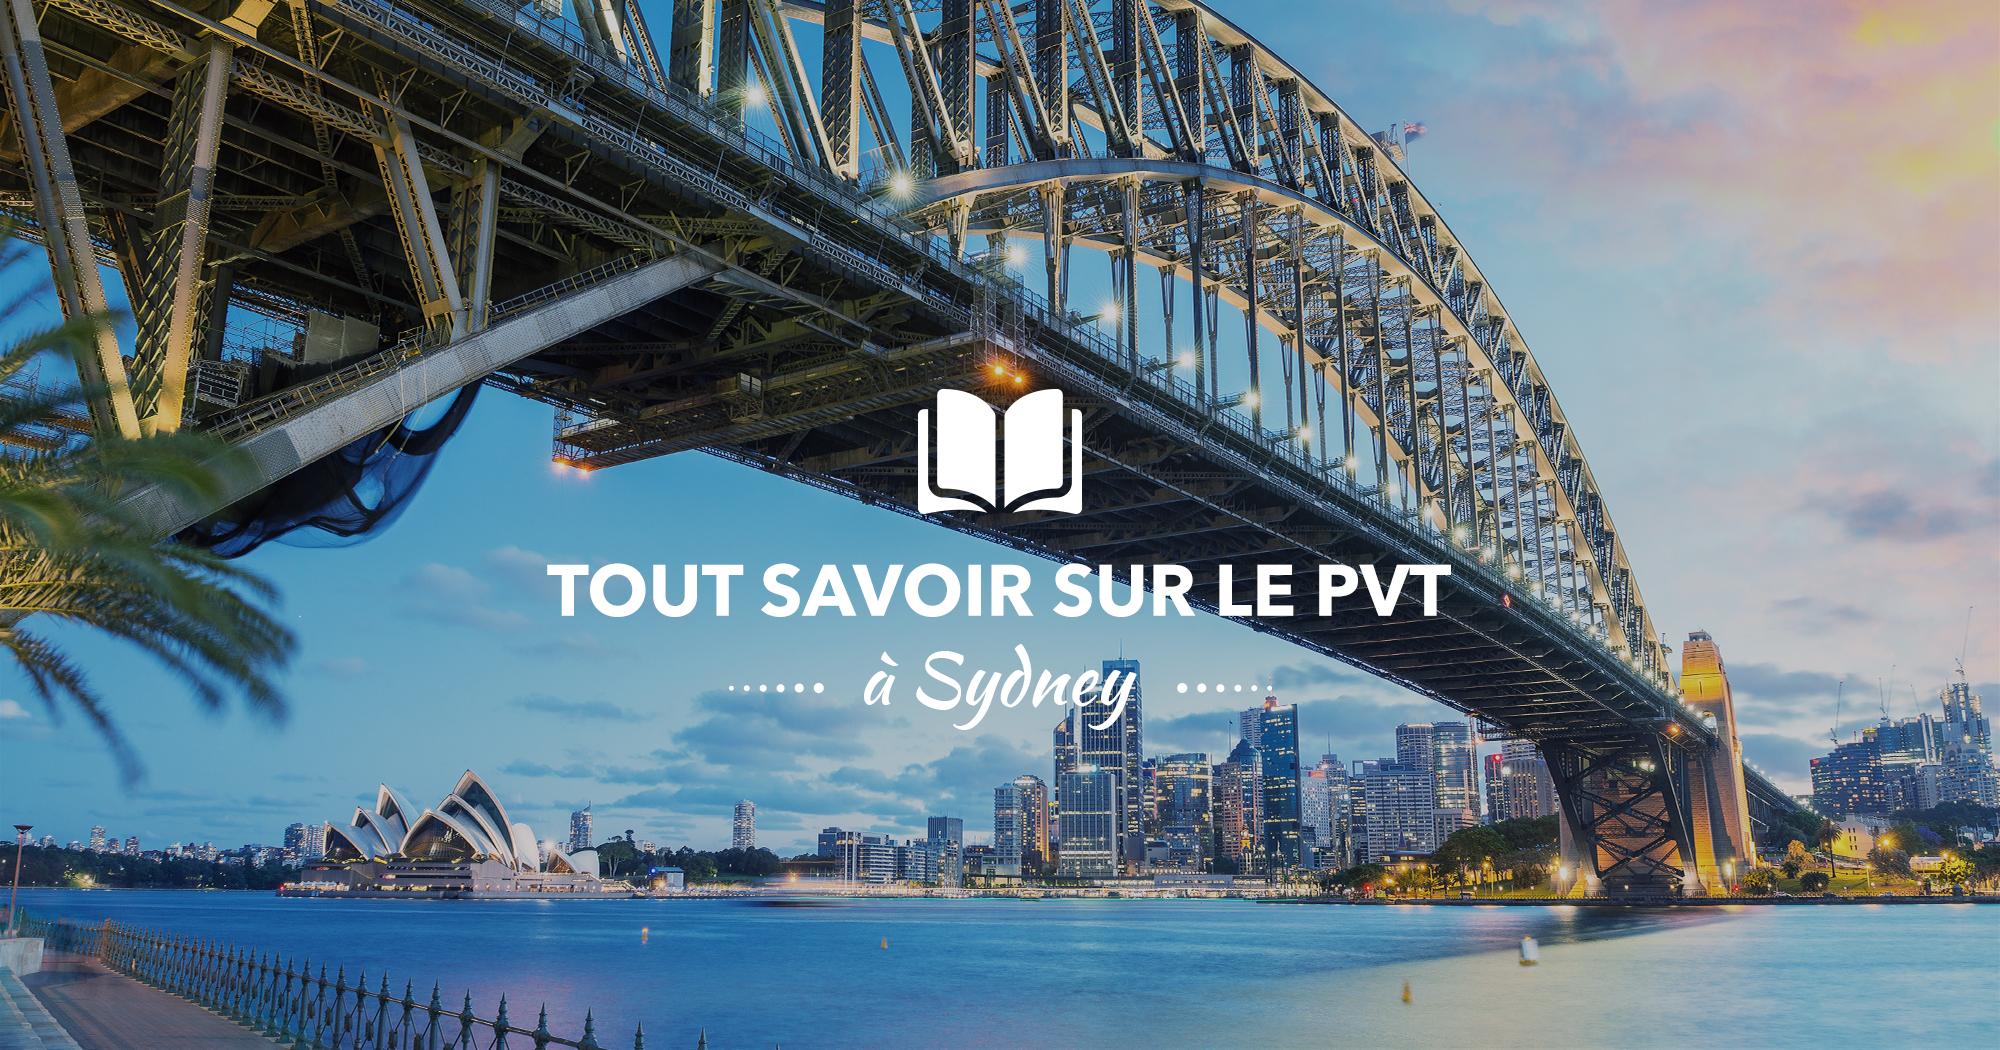 visuels-dossiers-whv-australie-pvt-sydney